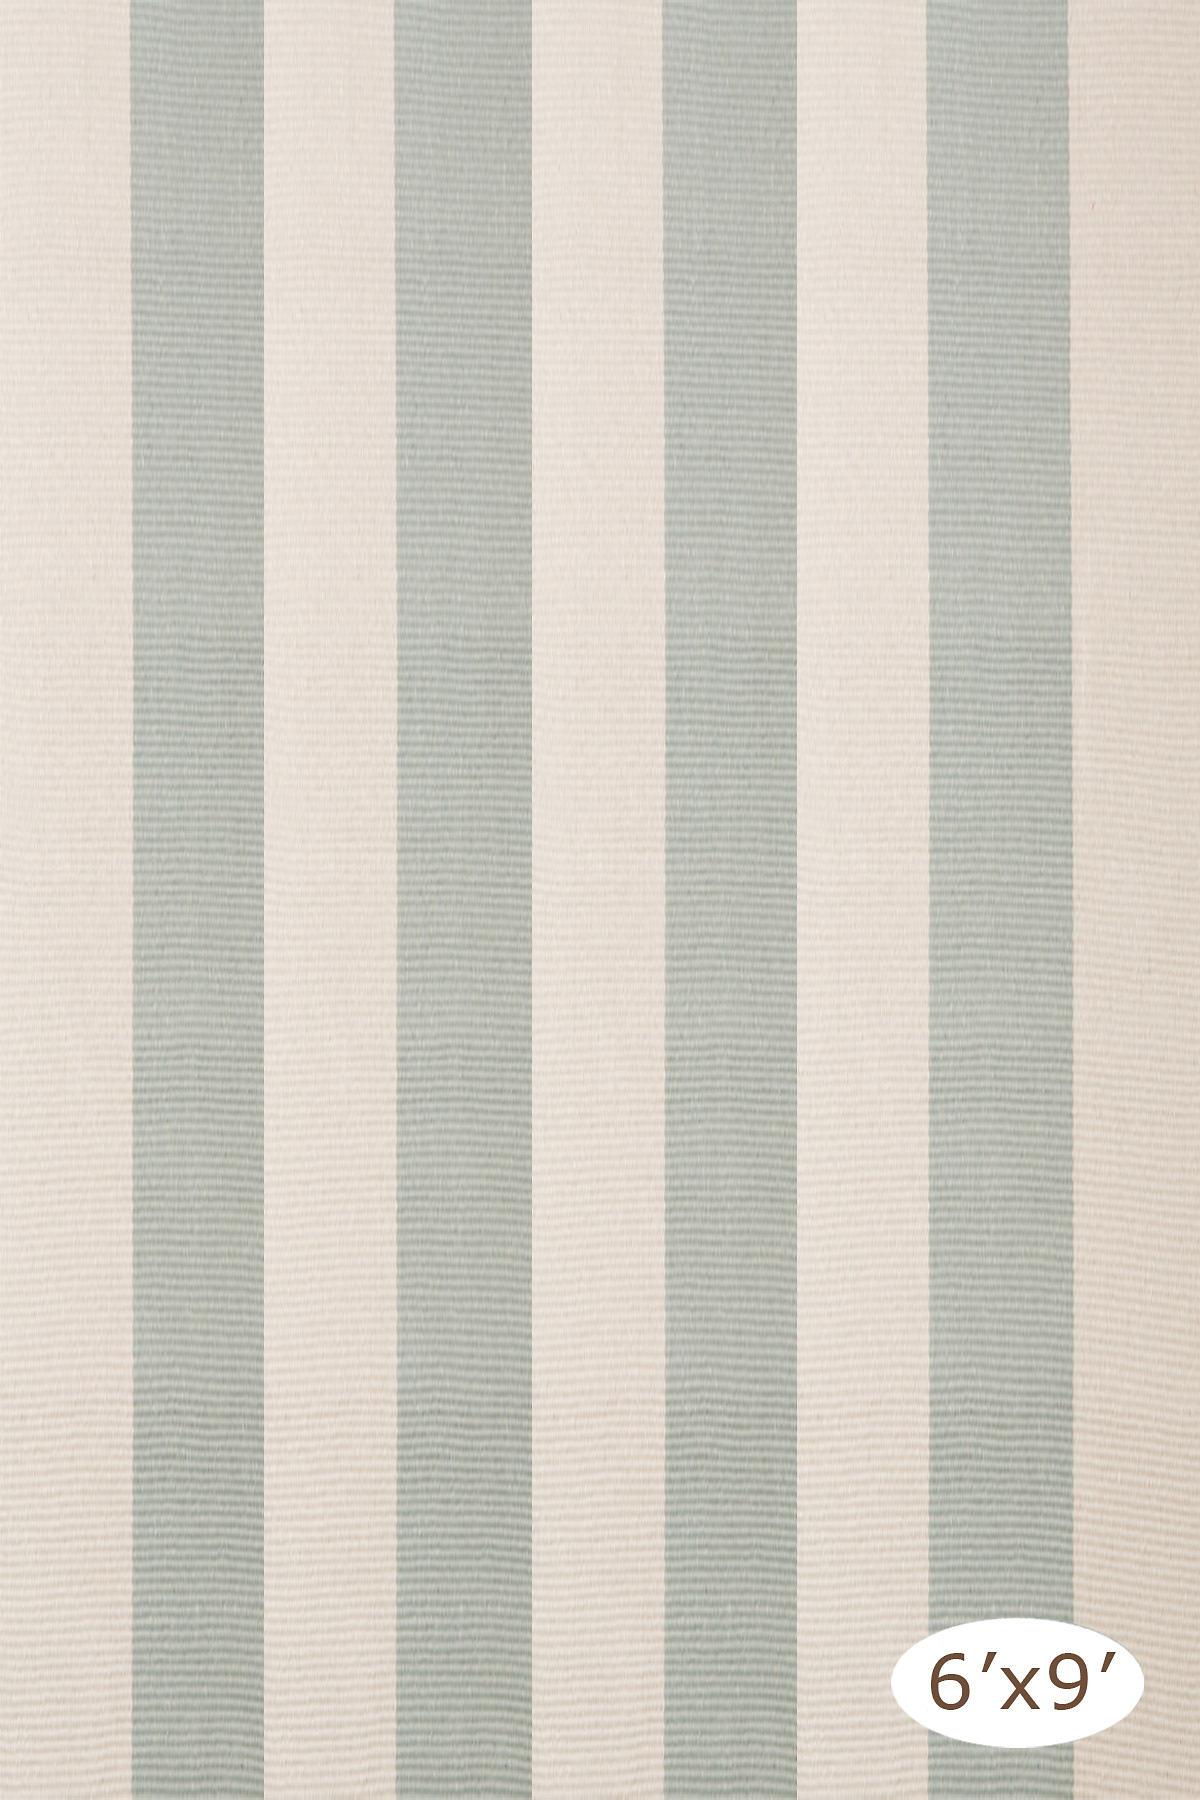 Yacht Stripe Ocean Woven Cotton Rug